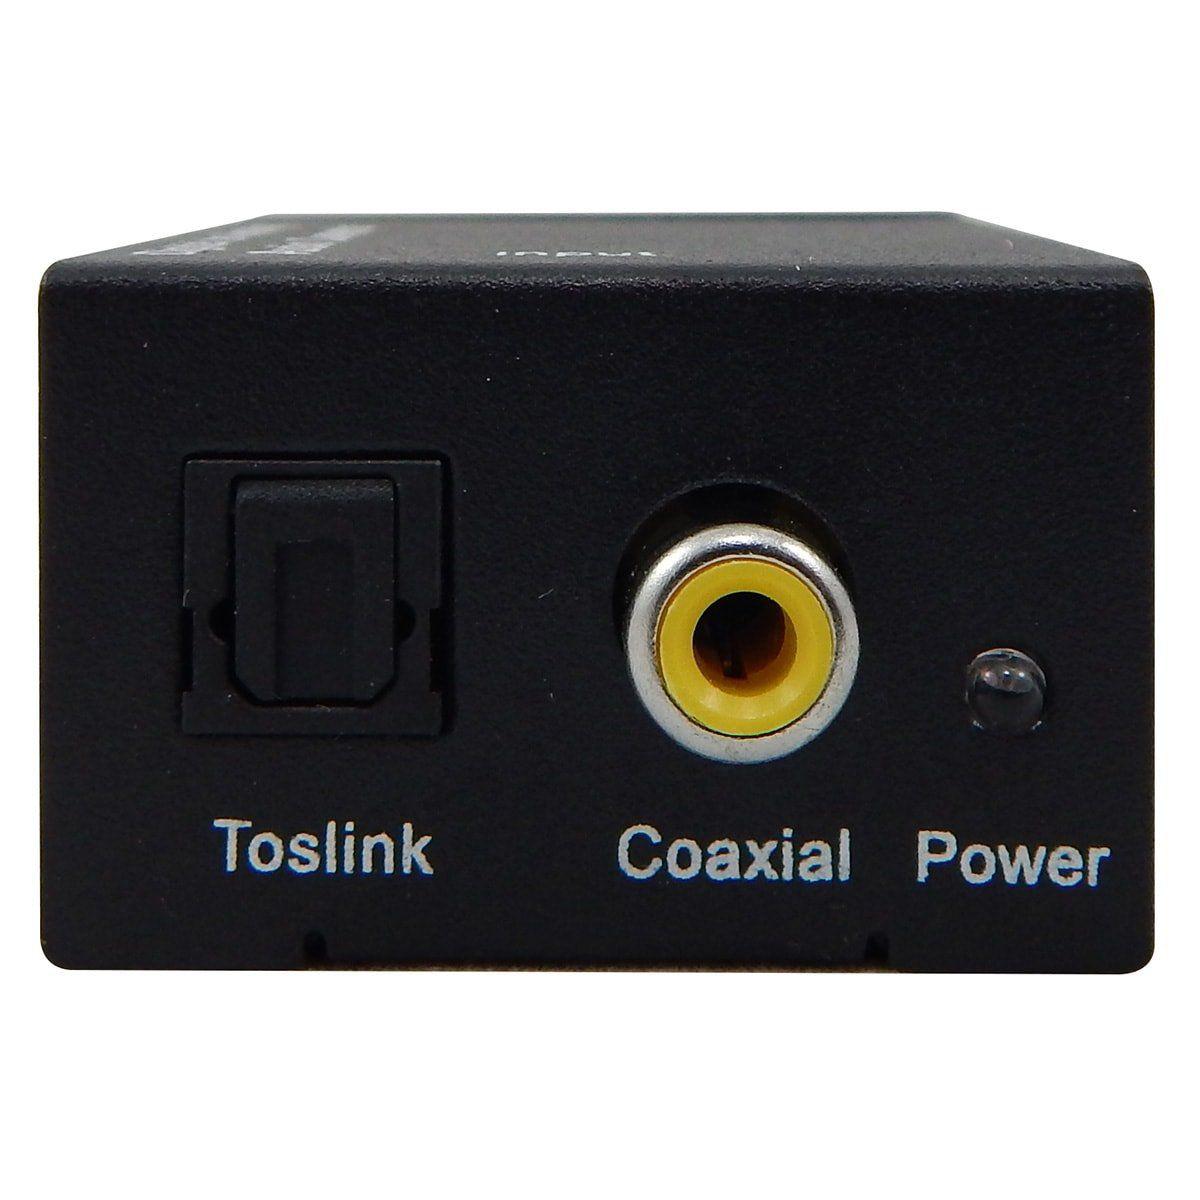 Kit Conversor Áudio Digital para RCA + Cabo Óptico Toslink 1,5 mts + Cabo Áudio Rca x Rca e Rca x P2